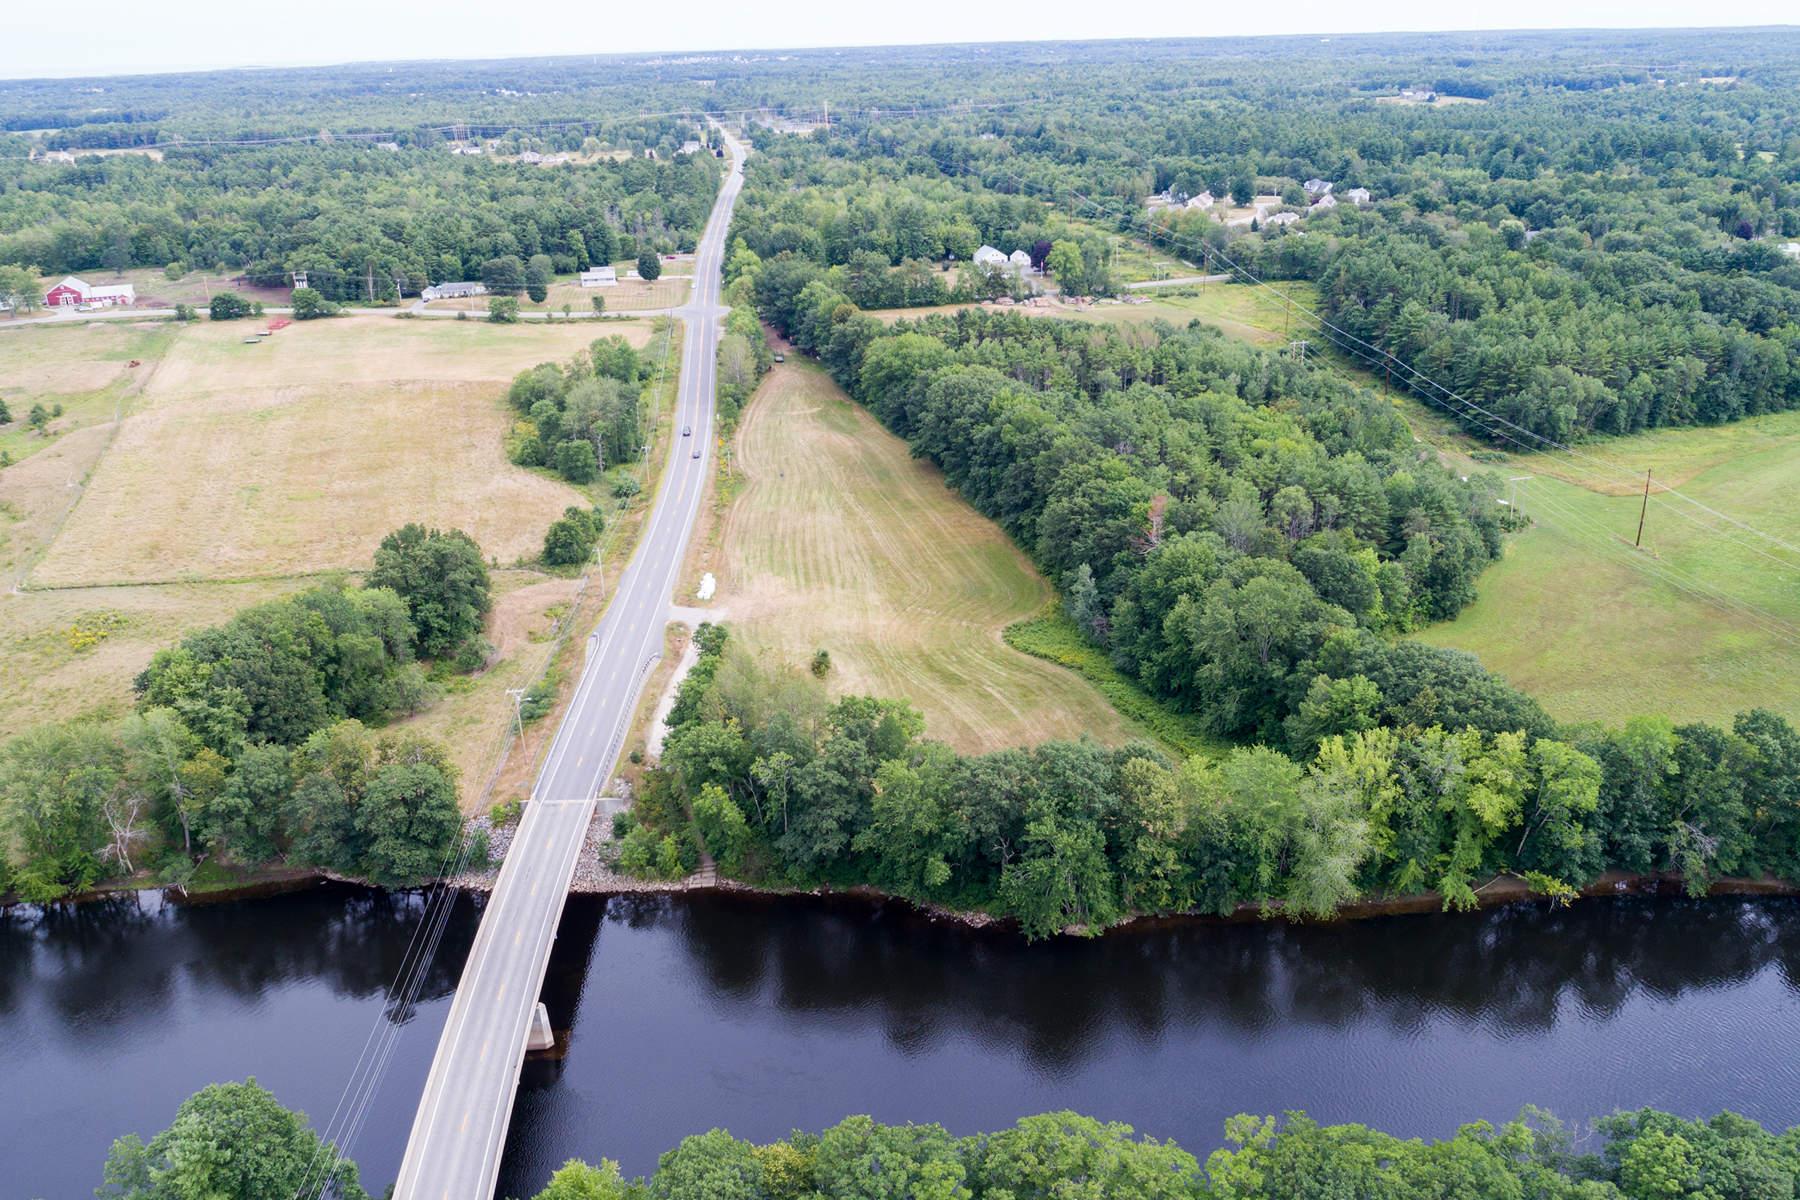 أراضي للـ Sale في 5.6 Acres on the Saco River 0 New County Road, Saco, Maine 04072 United States